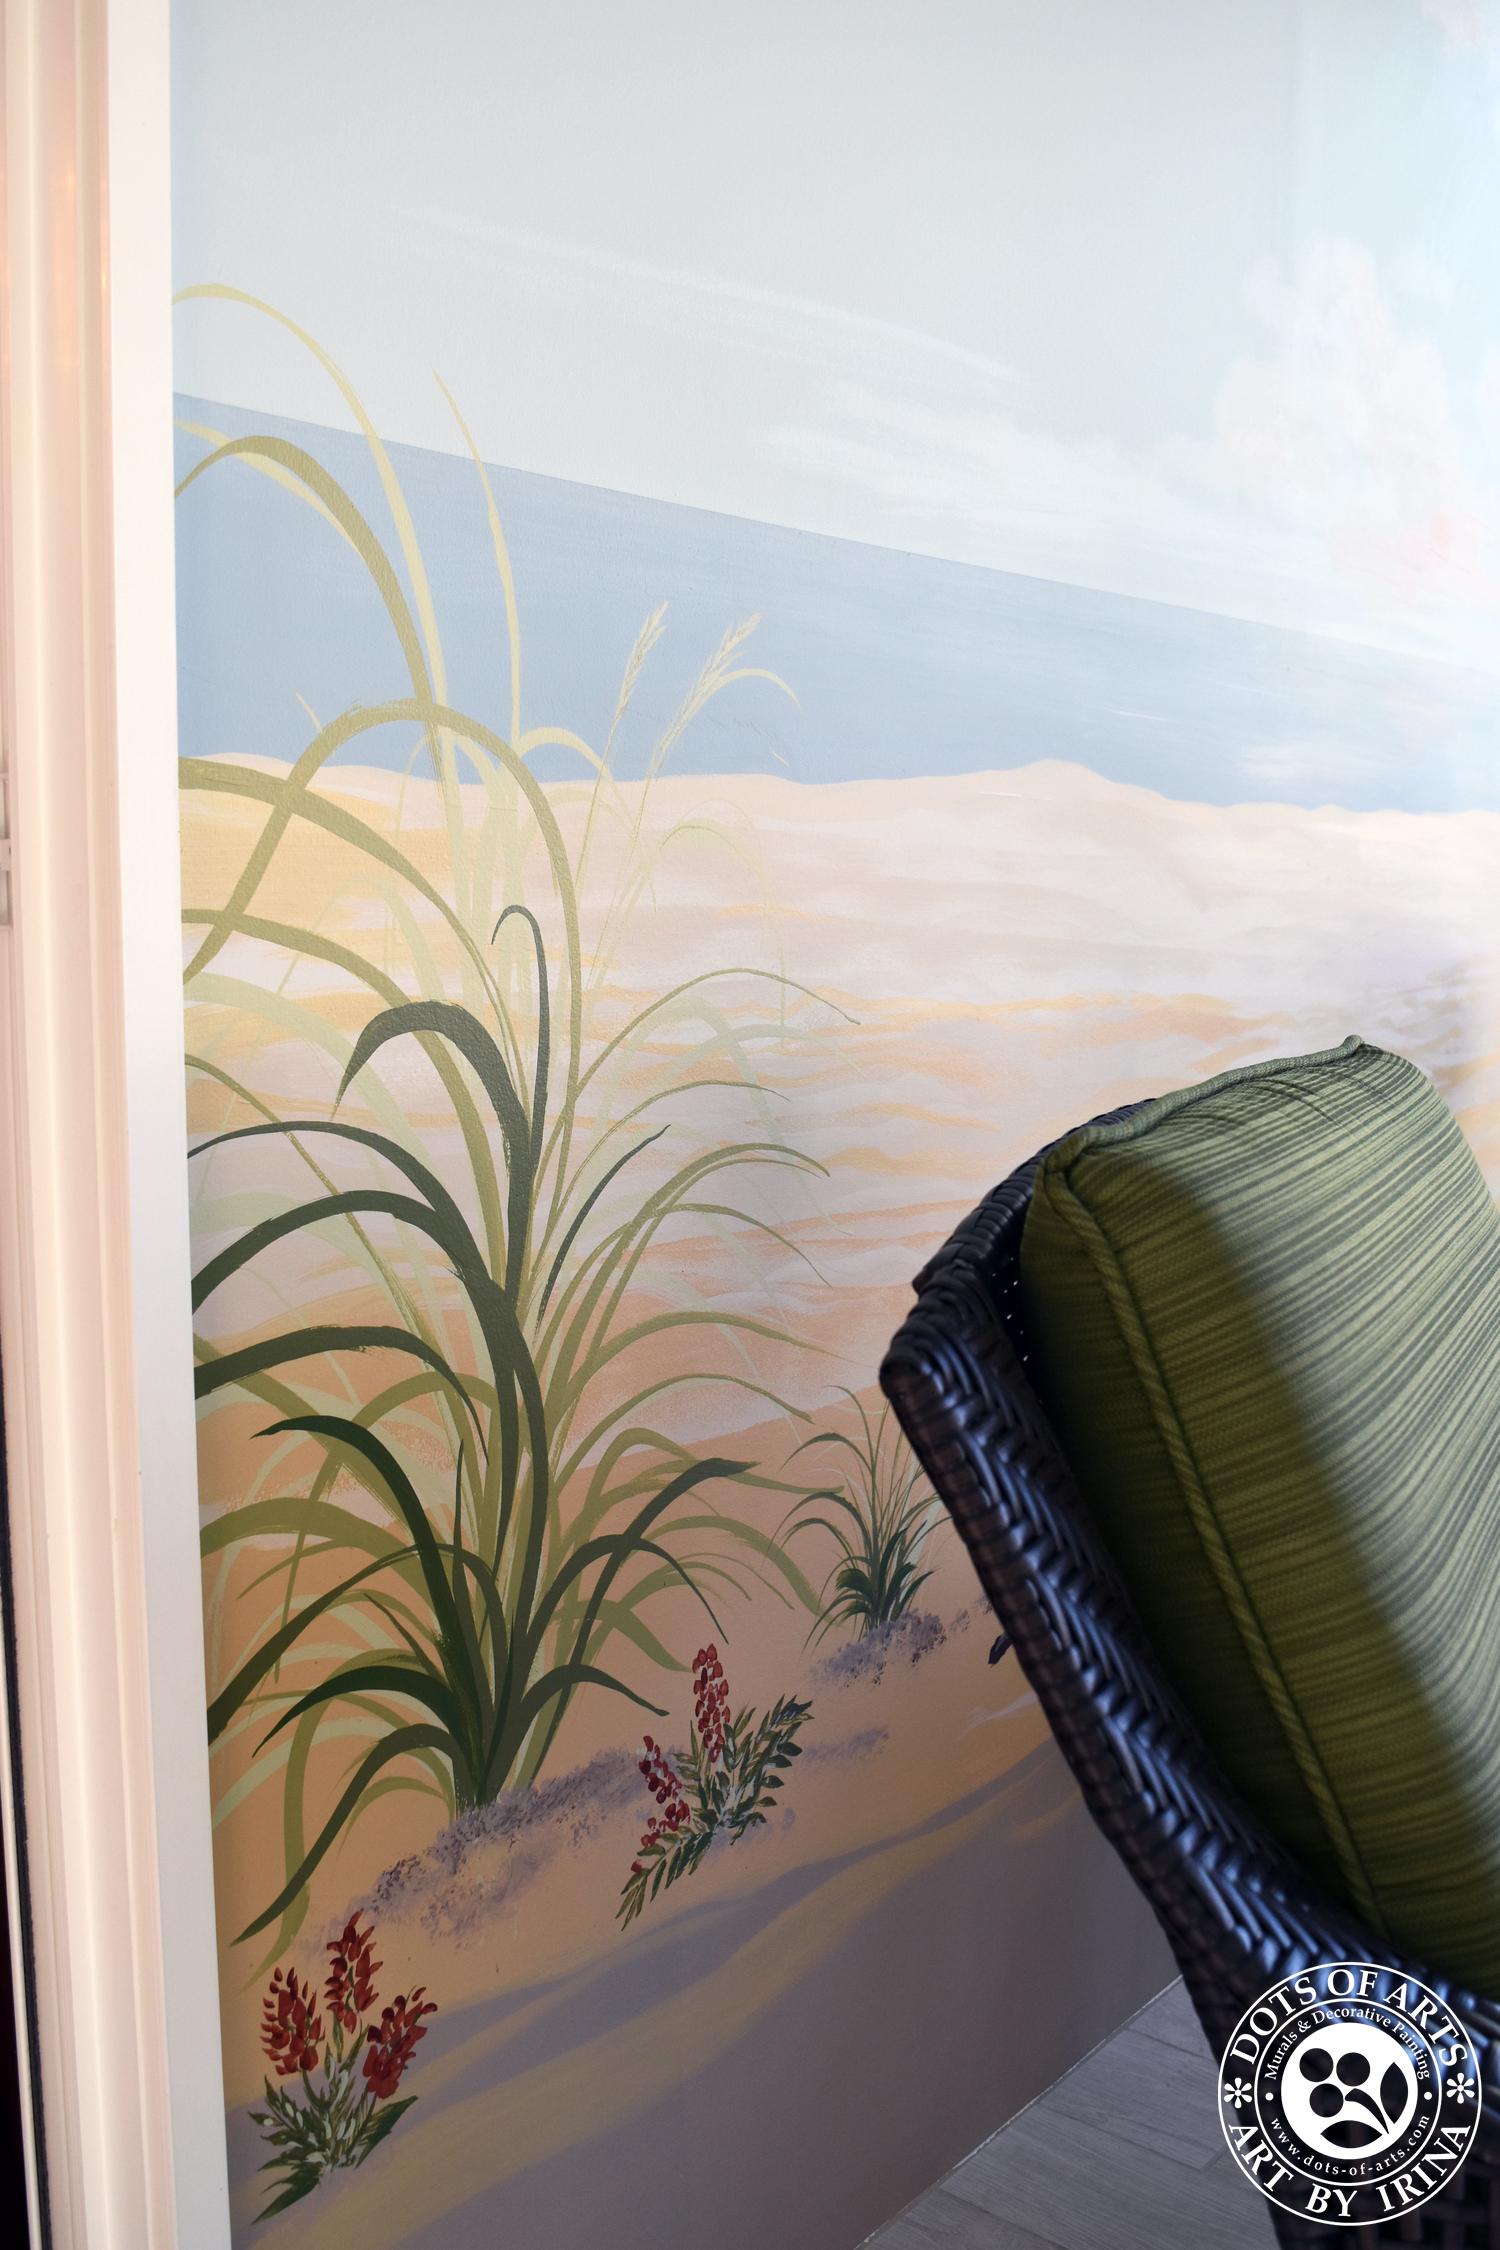 florida-room-mural-full-room-dots-of-arts-detail-chair.jpg